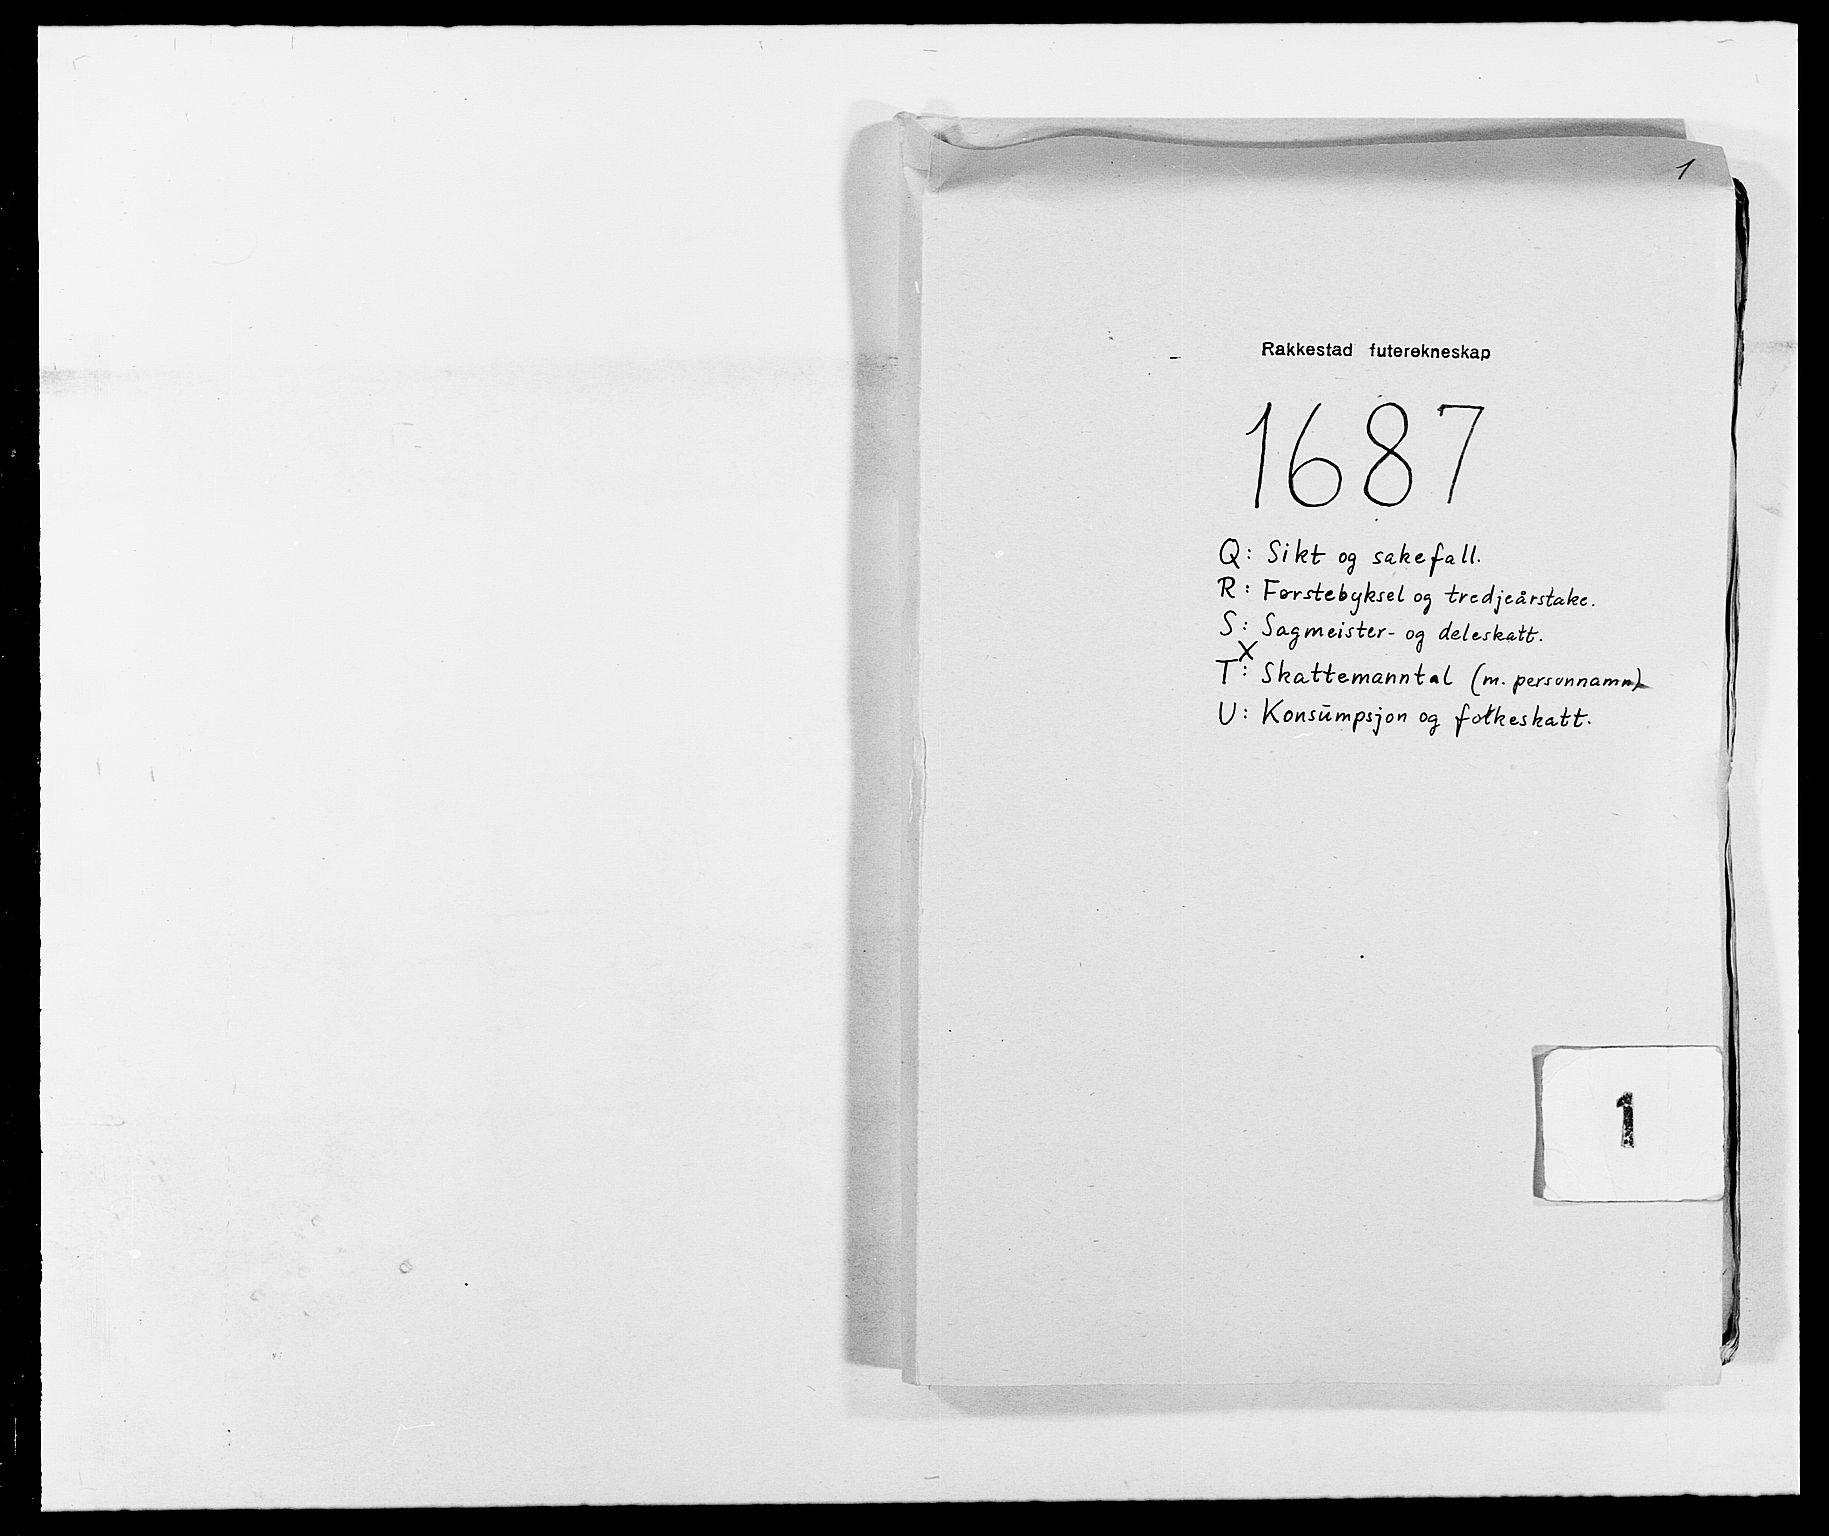 RA, Rentekammeret inntil 1814, Reviderte regnskaper, Fogderegnskap, R05/L0276: Fogderegnskap Rakkestad, 1683-1688, s. 1